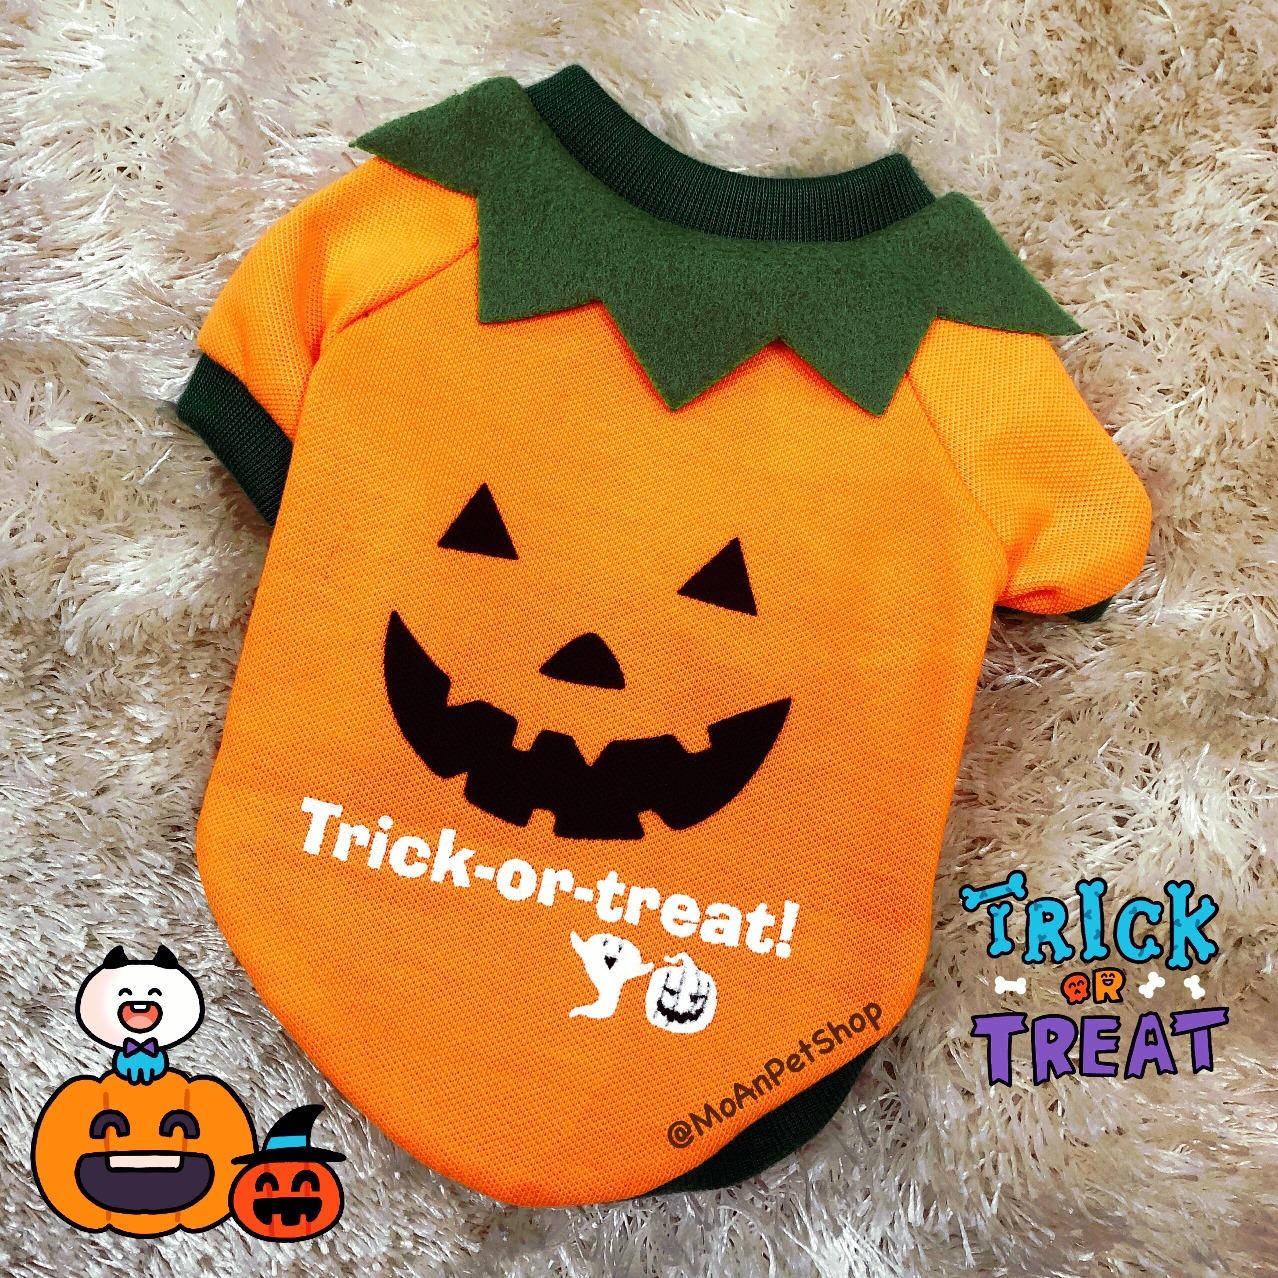 Áo Halloween Trick-or-treat có Tay 1kg - 15kg